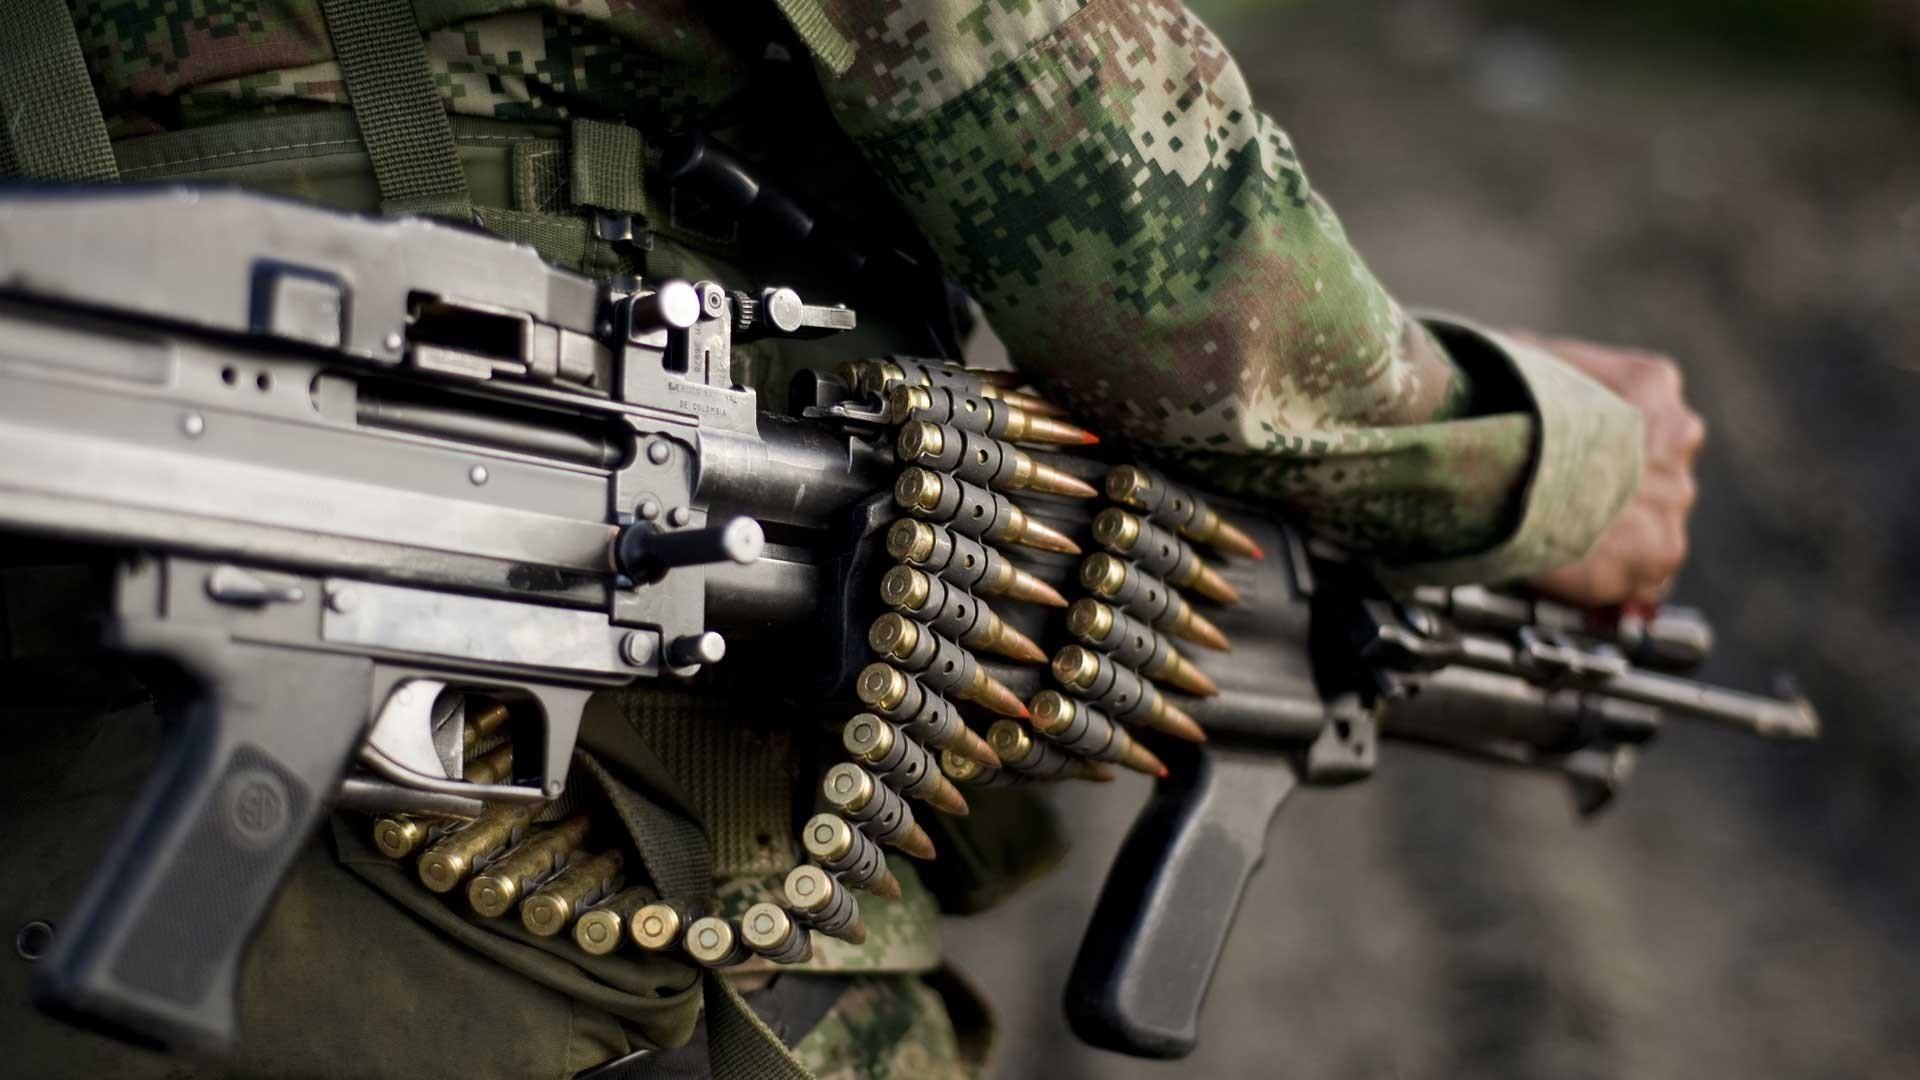 1920x1080 Machine Gun Wallpapers Bullets